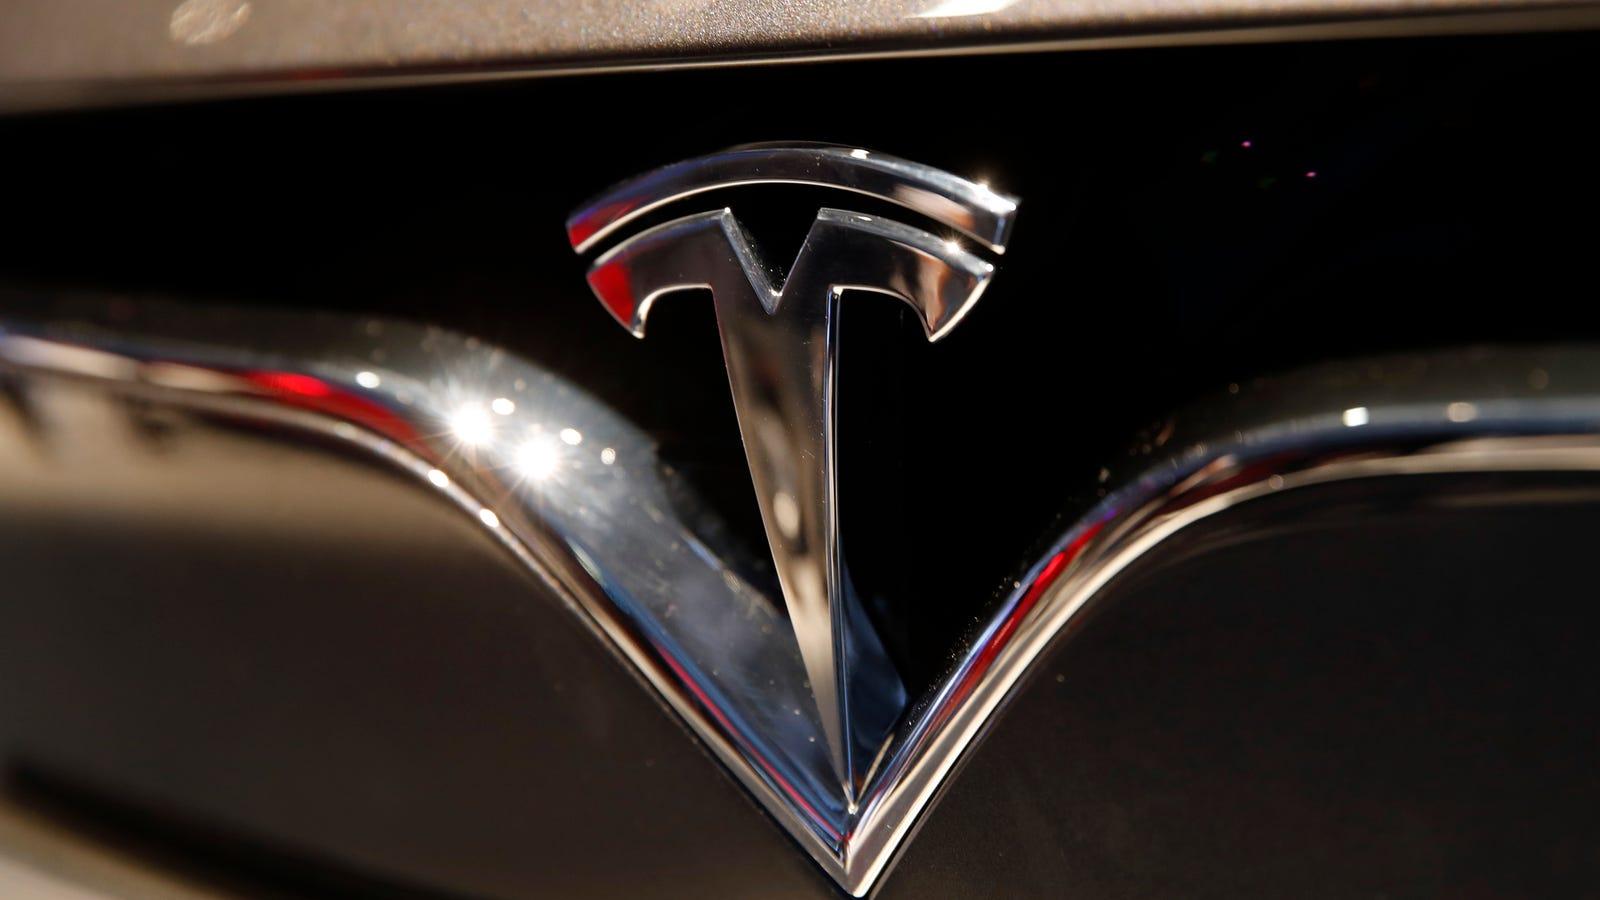 James Murdoch, Son Of Rupert, Likely to Replace Elon Musk as Tesla Chairman: Report